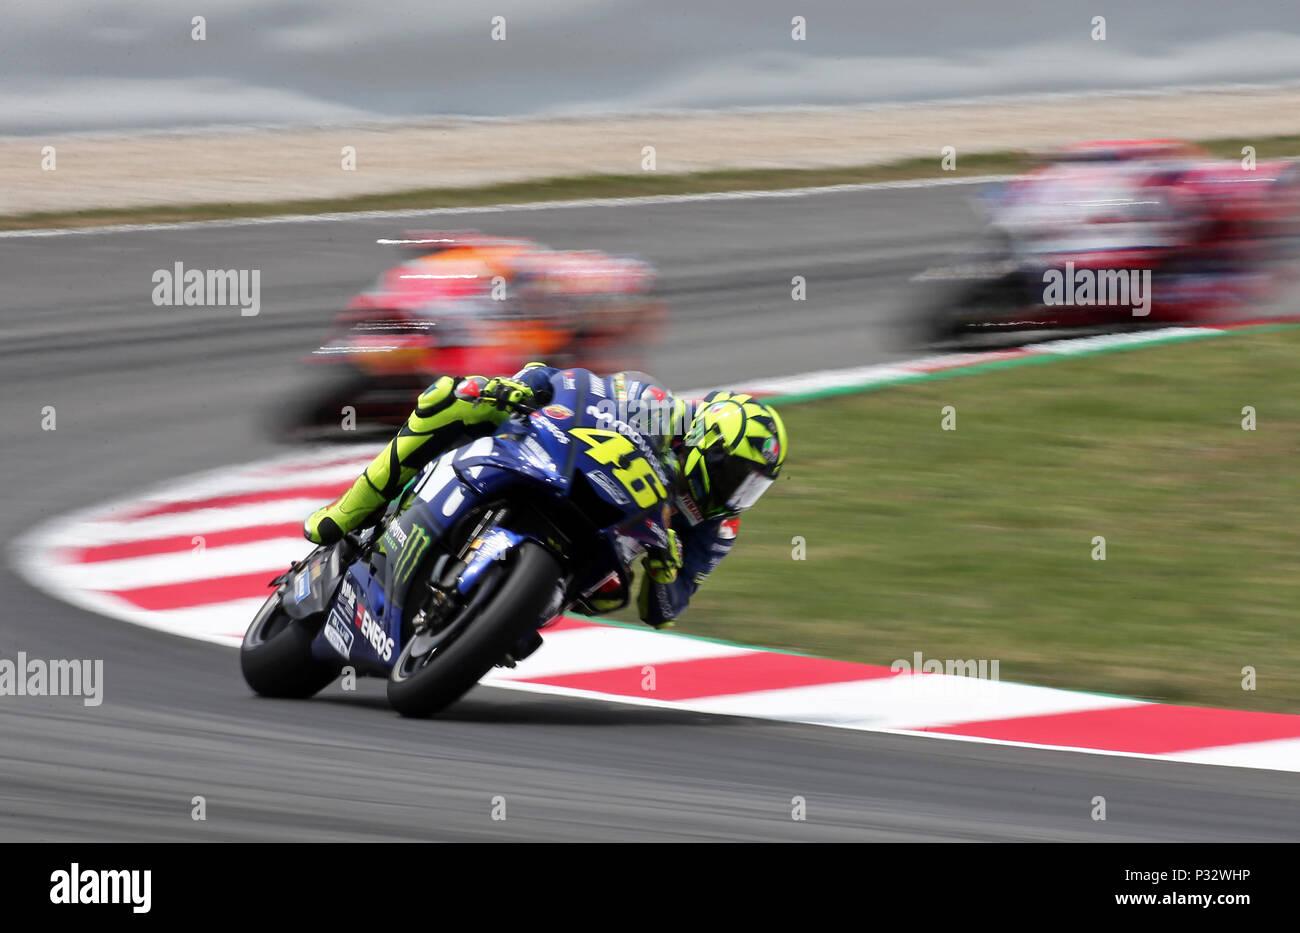 Barcelona -17th June 2018- SPAIN: Valentino Rossi (Yamaha) during  the GP Catalunya Moto GP, in the Barcelona-Catalunya Circuit, on 17th June 2018. Photo: Joan Valls/Urbanandsport/Cordon Press - Stock Image